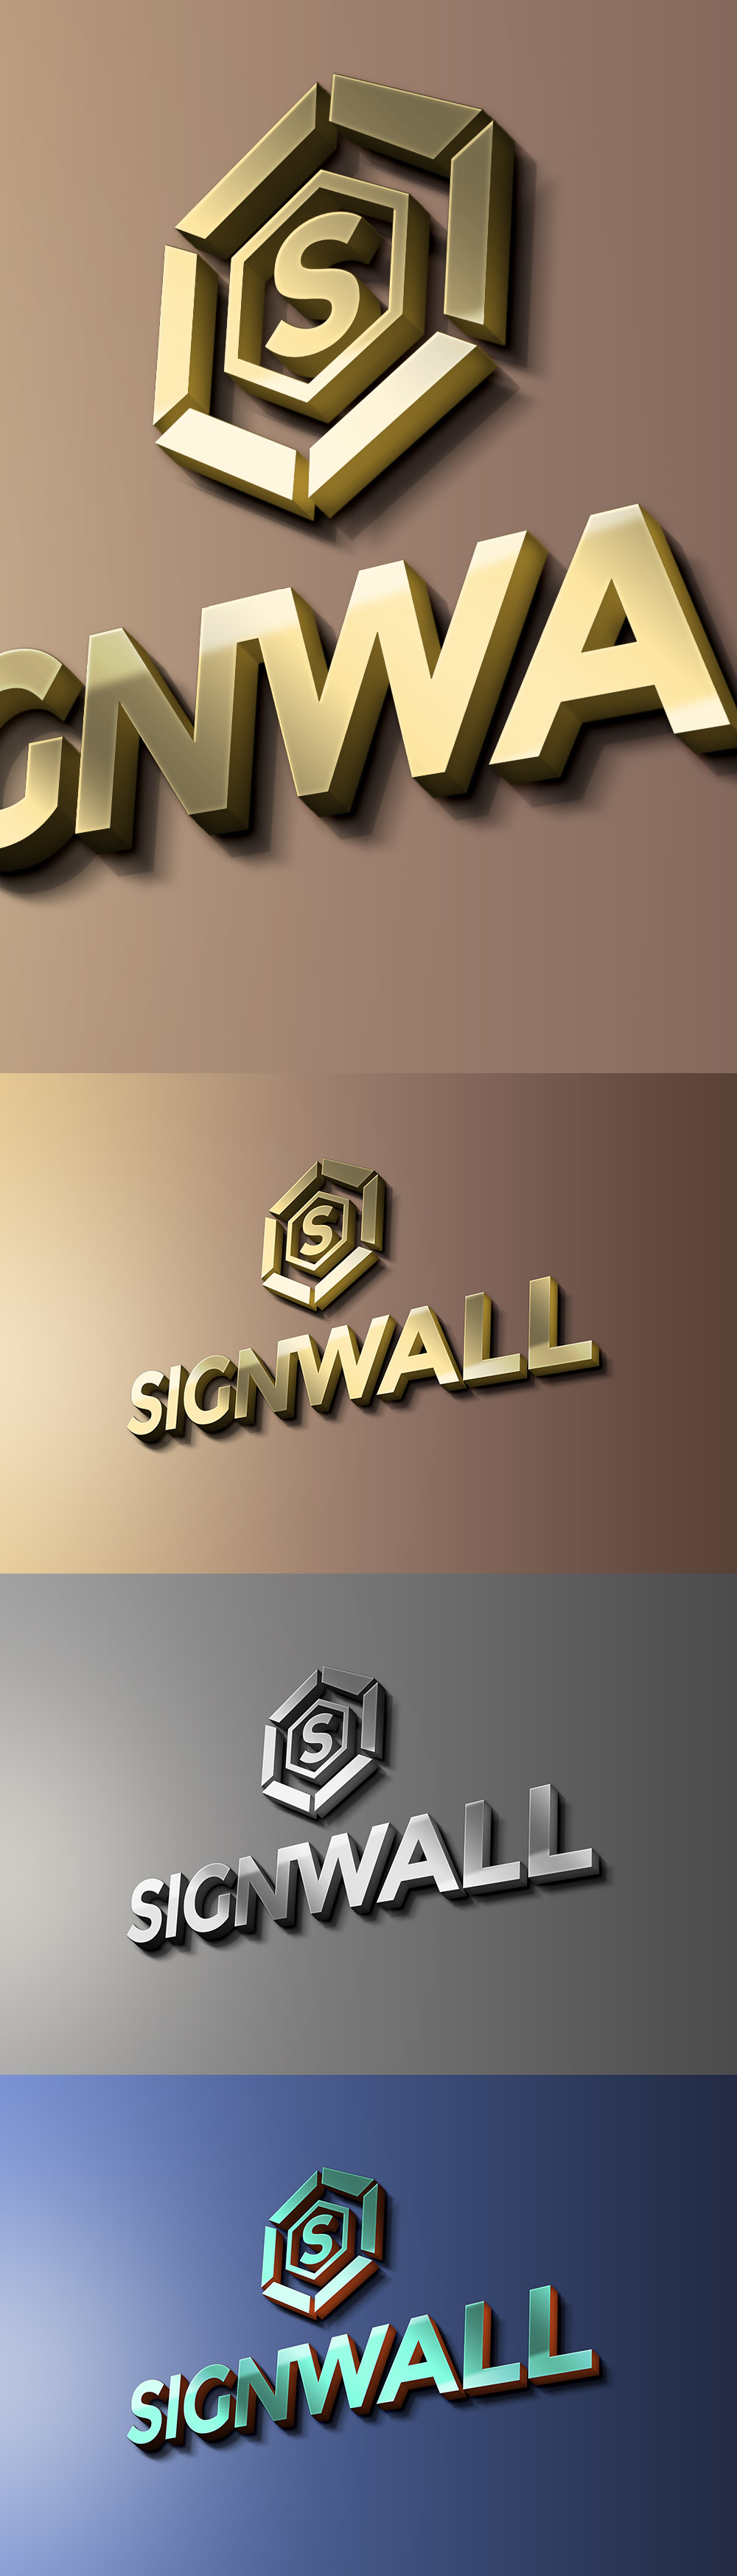 دانلود موکاپ لوگو سه بعدی نقره ای و طلایی روی دیوار